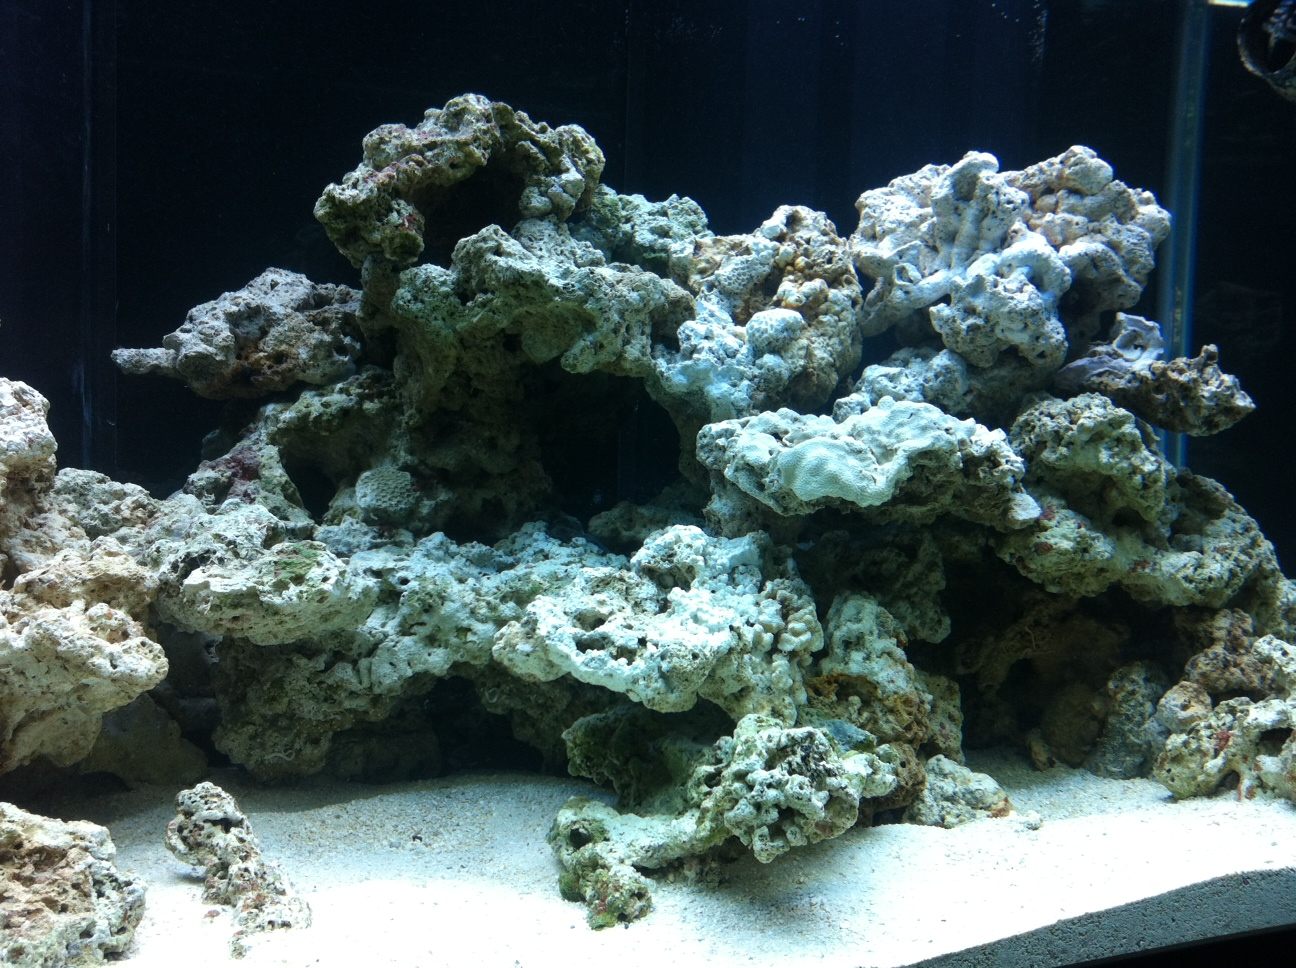 120 Gallon Reef Display: Upgrading